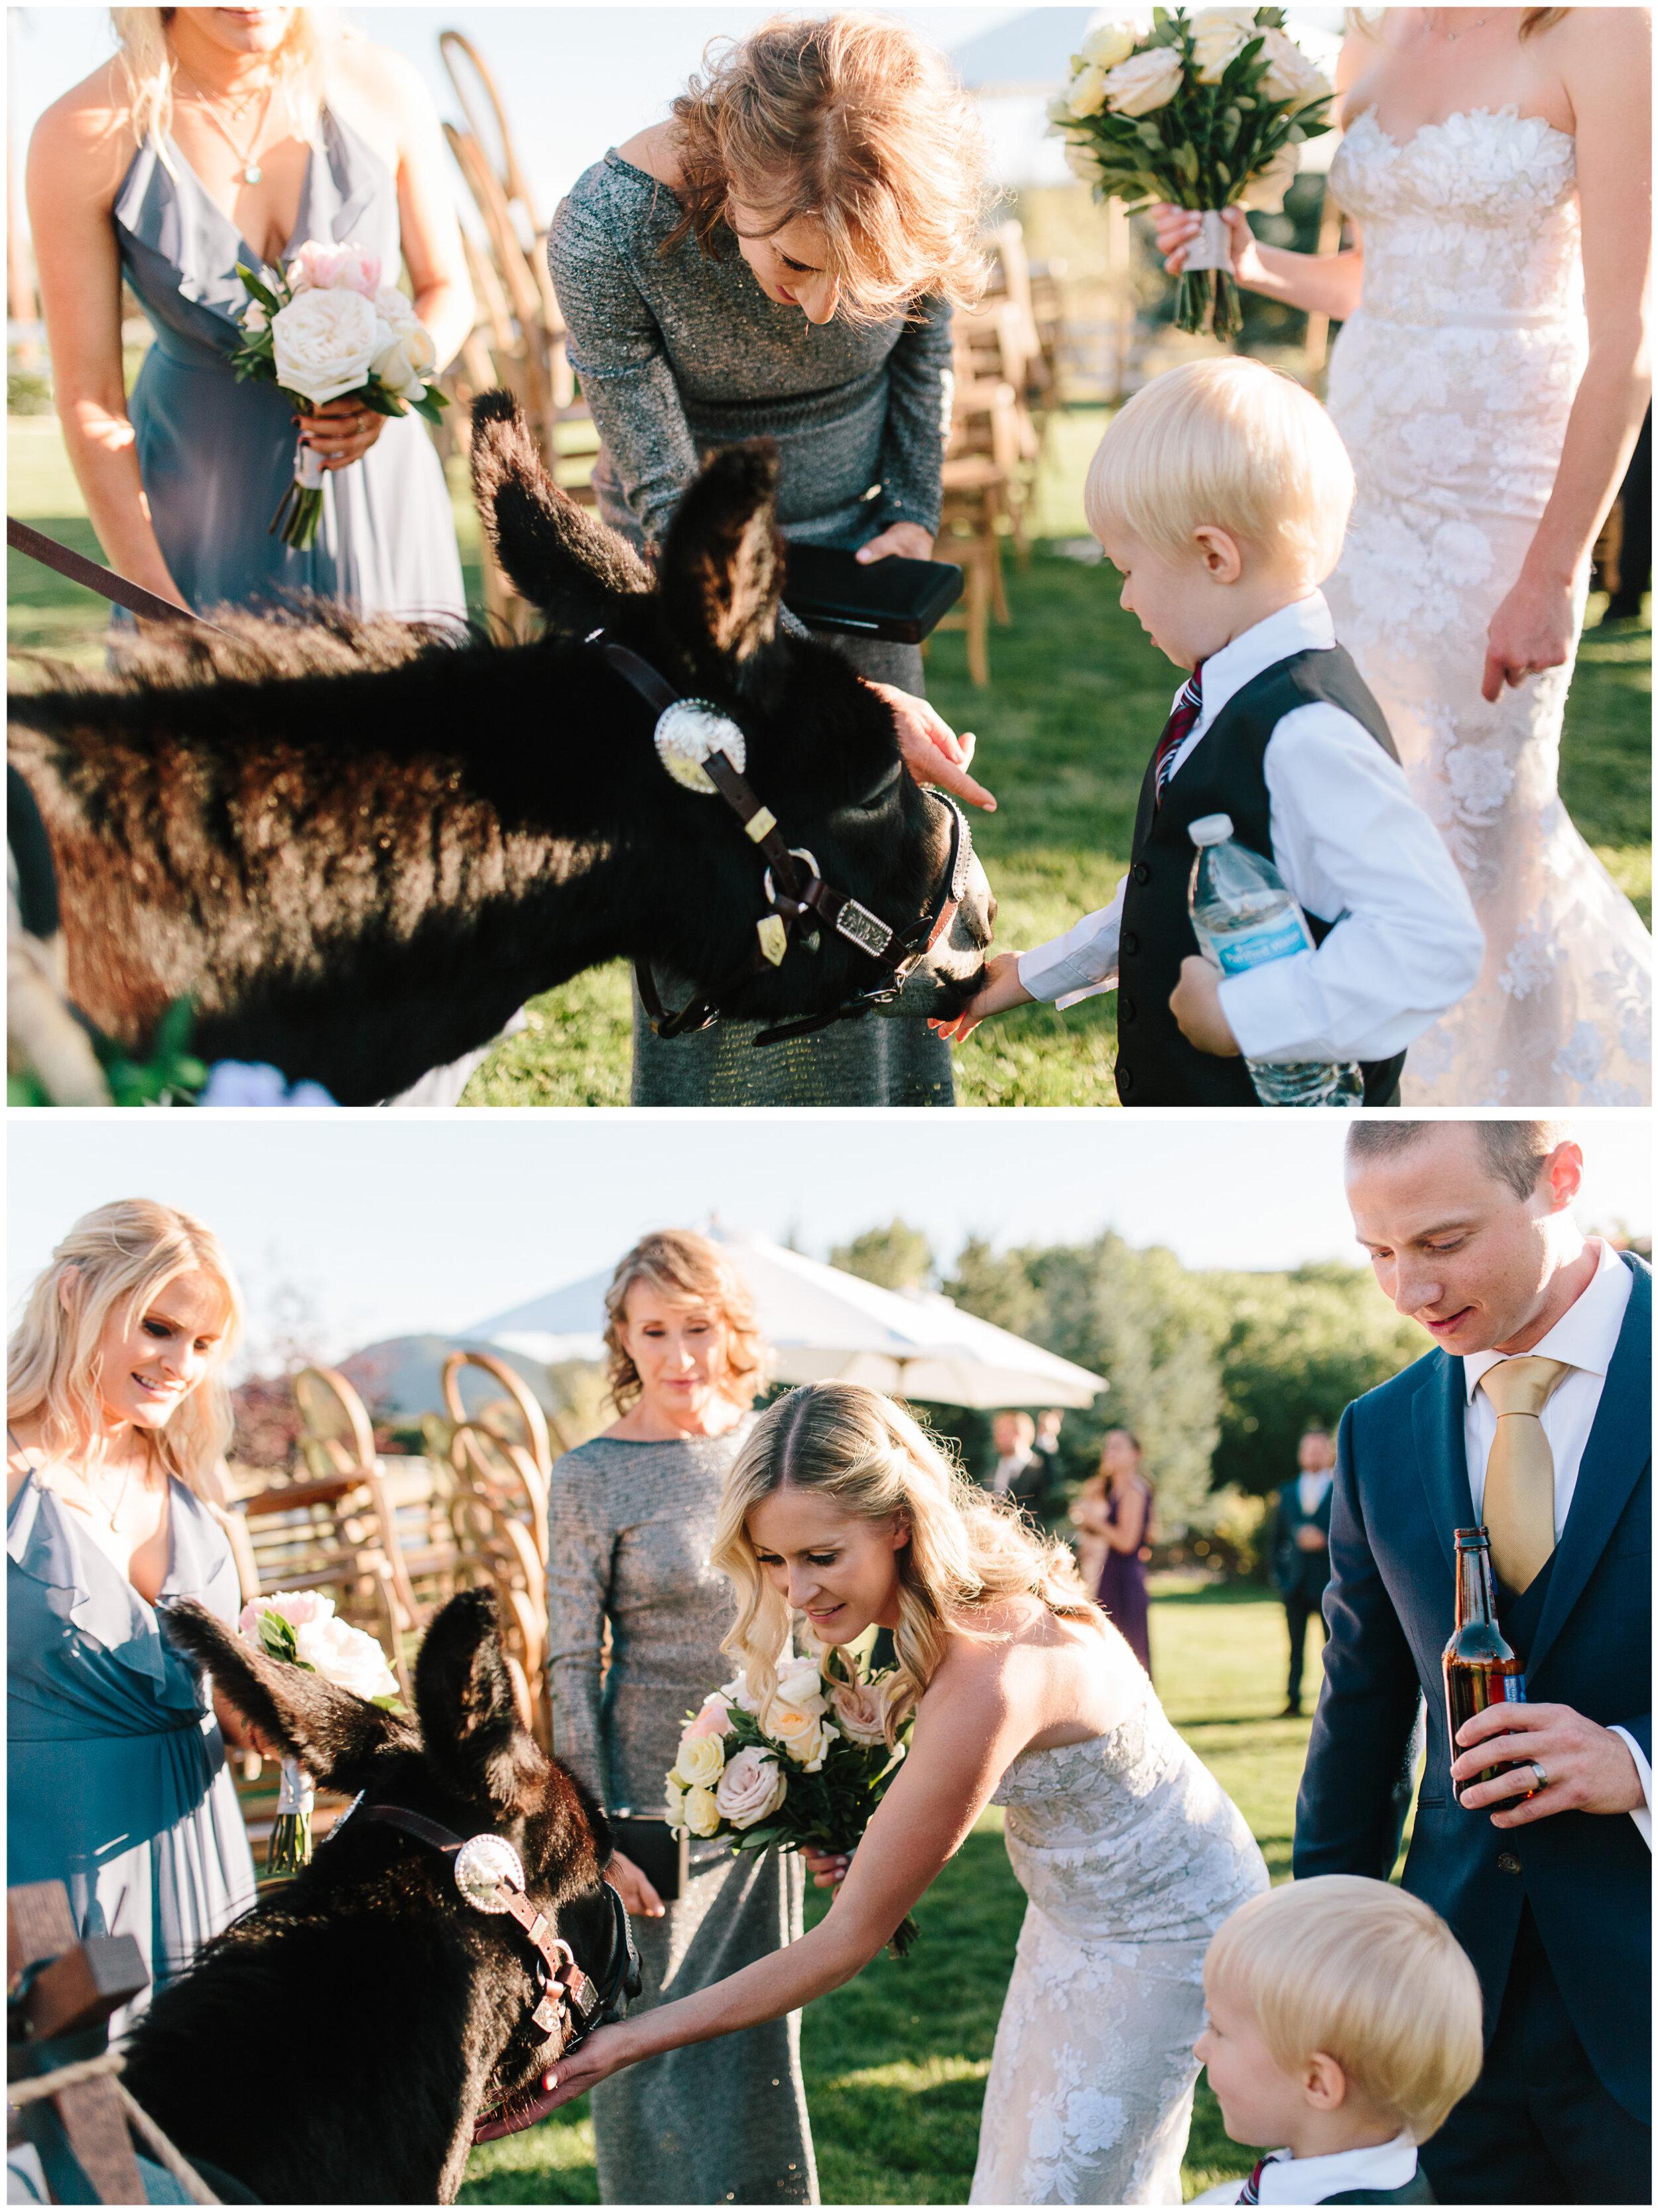 larkspur_colorado_wedding_49.jpg